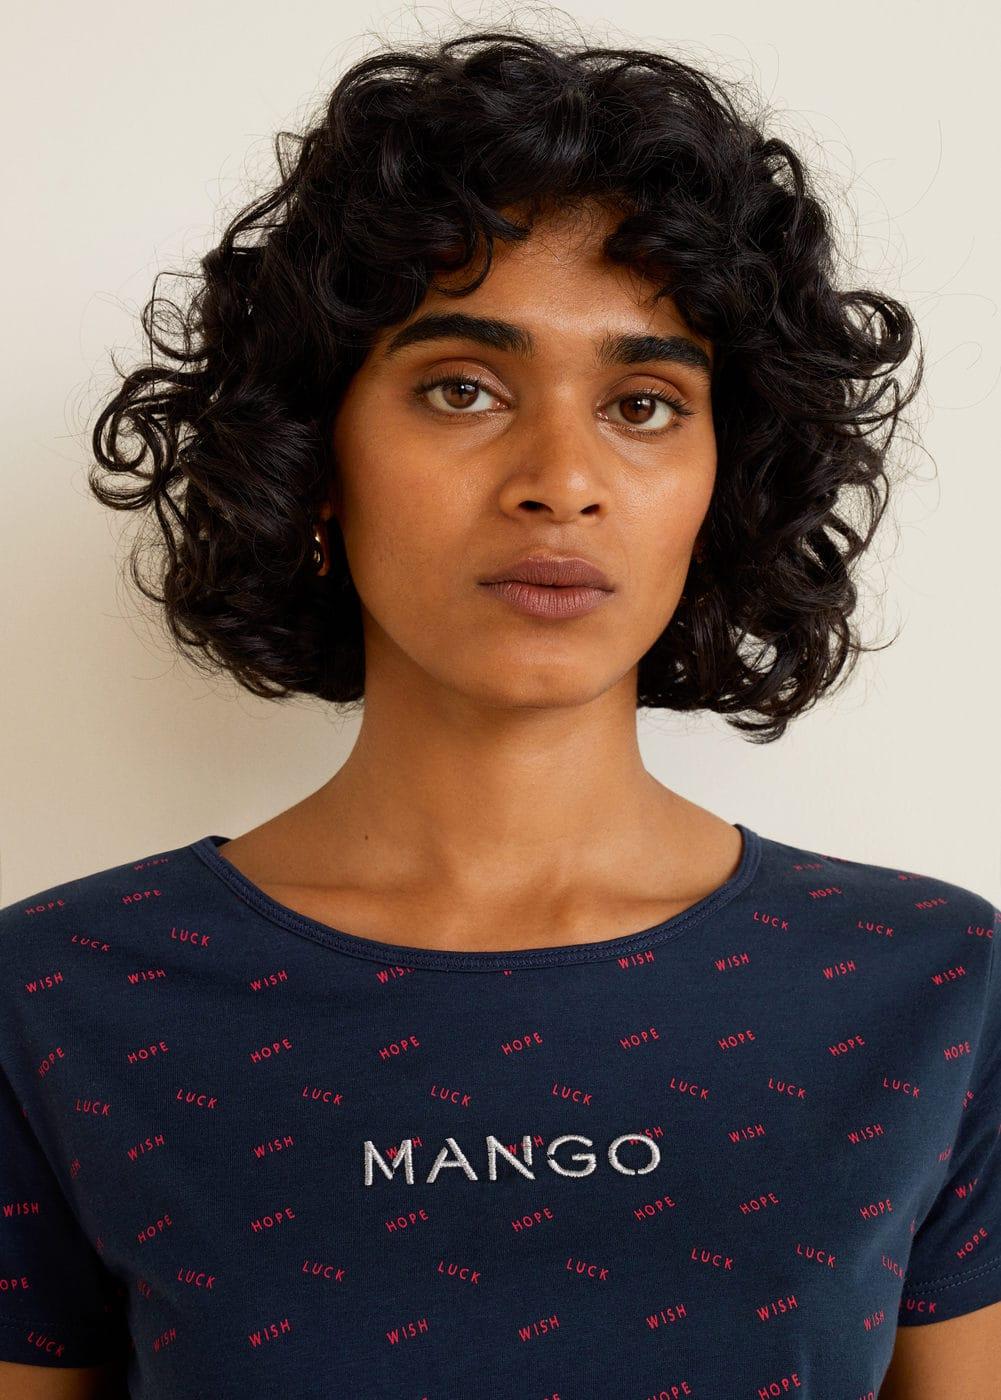 Mango - Embroidered logo t-shirt - 4